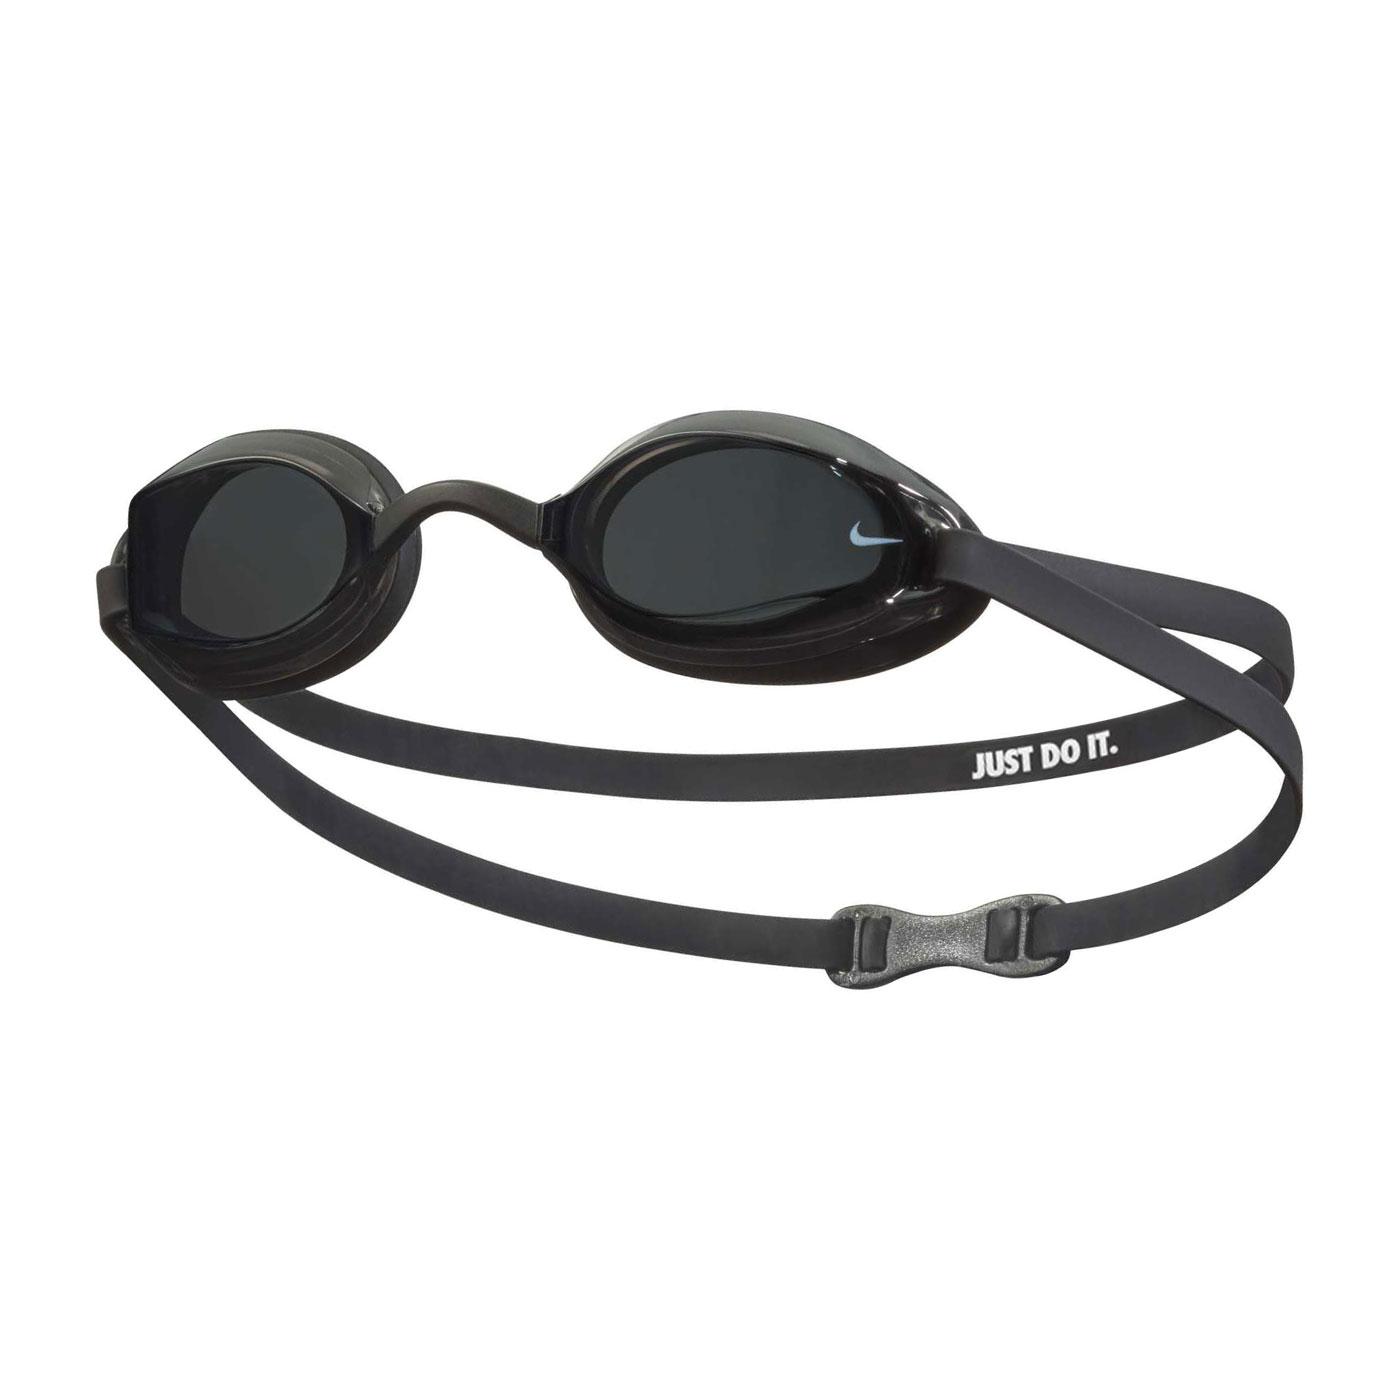 NIKE SWIM 成人專業型泳鏡 NESSA179-014